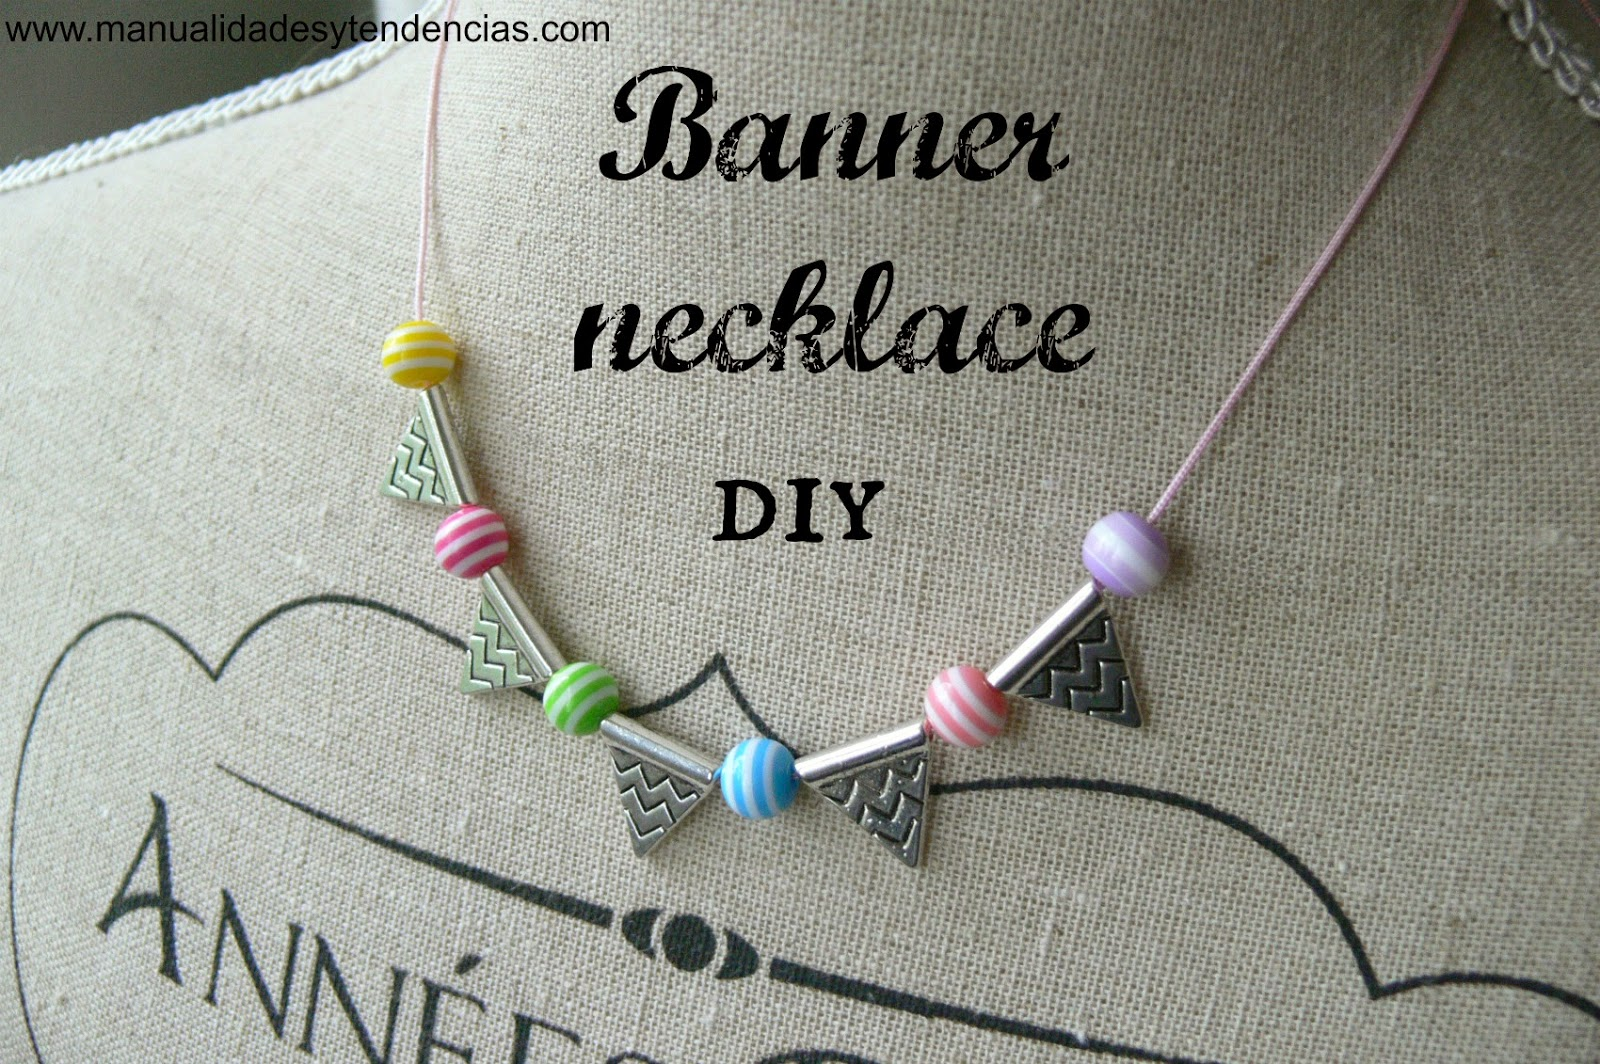 Banner necklace diy